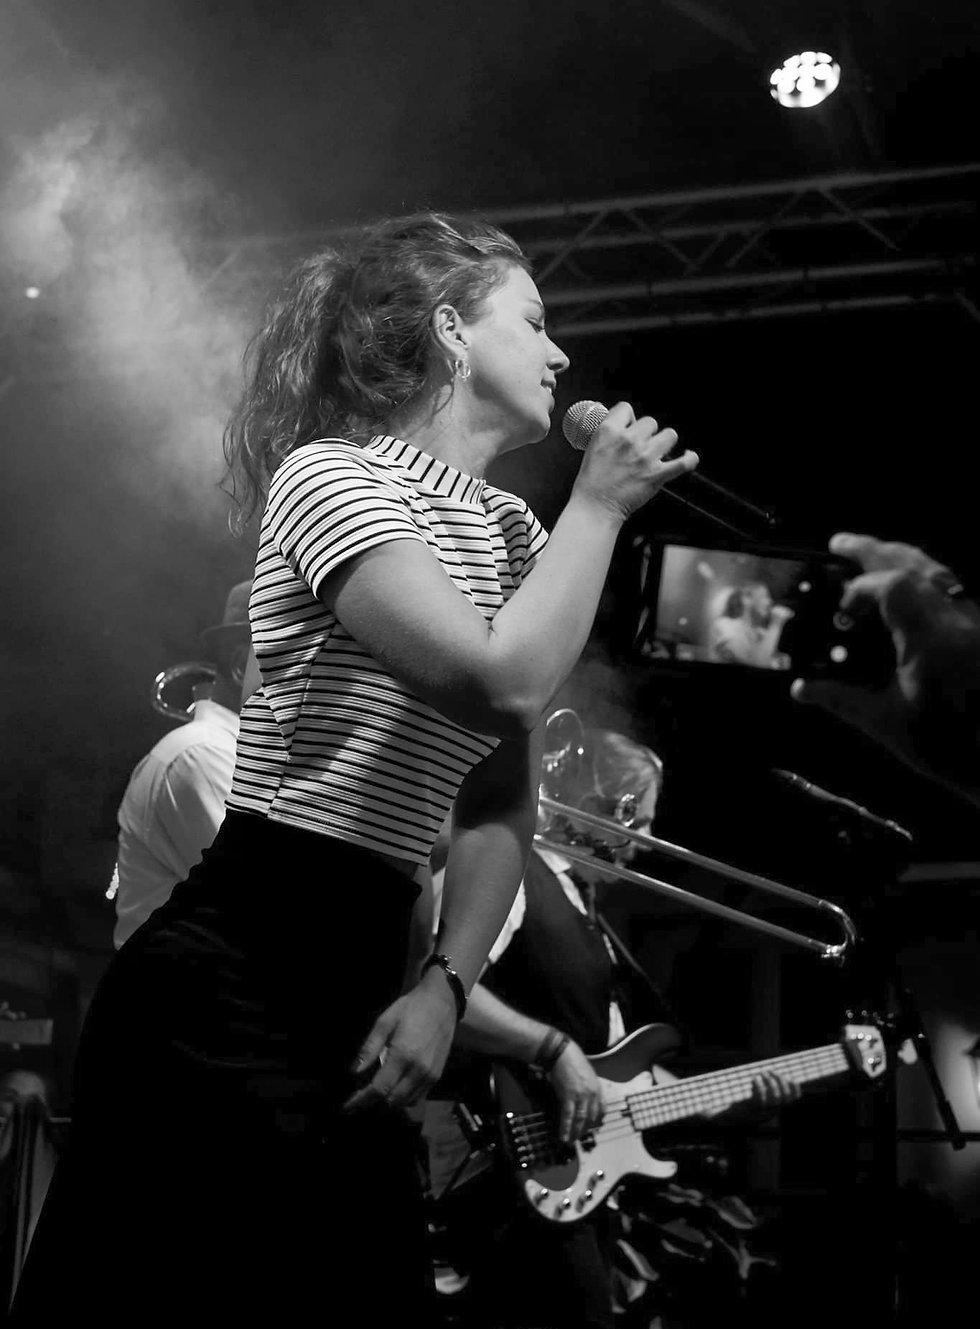 Sophie-Becker-Solo-Sängerin-blackandwhit